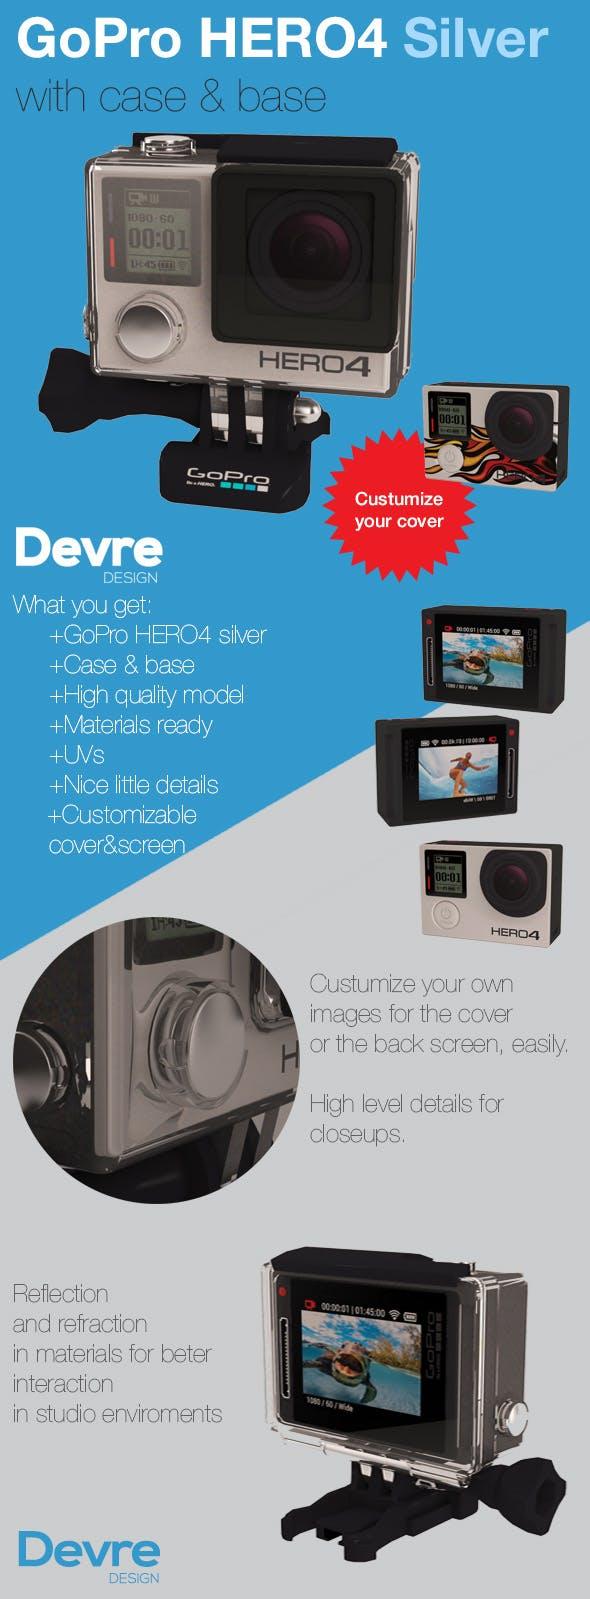 GoPro HERO 4 Silver - 3DOcean Item for Sale